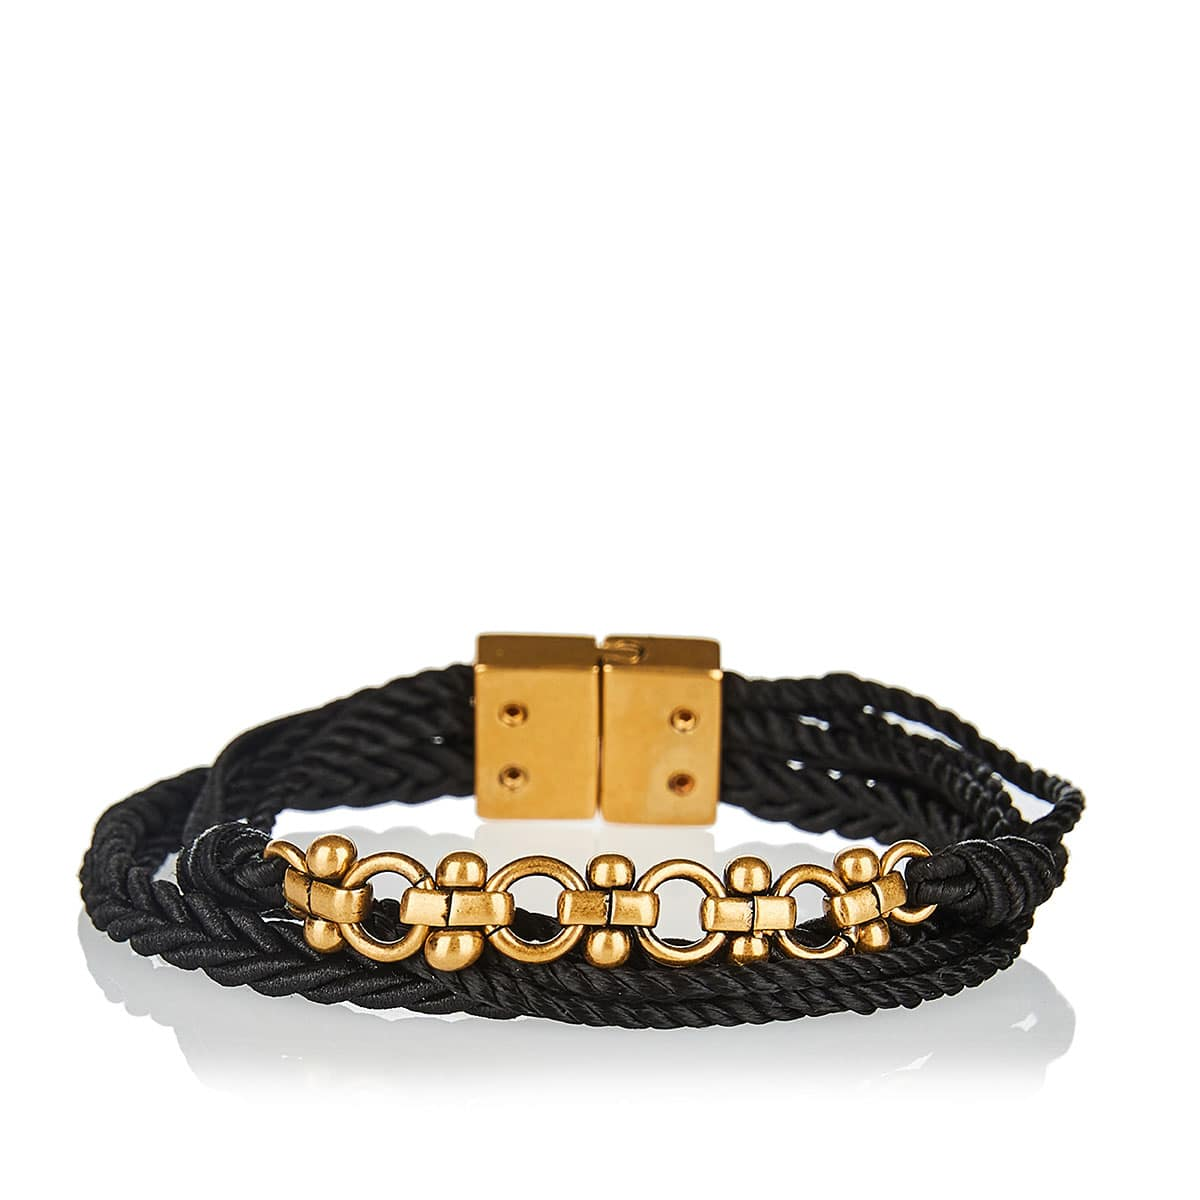 Embellished braided cord bracelet